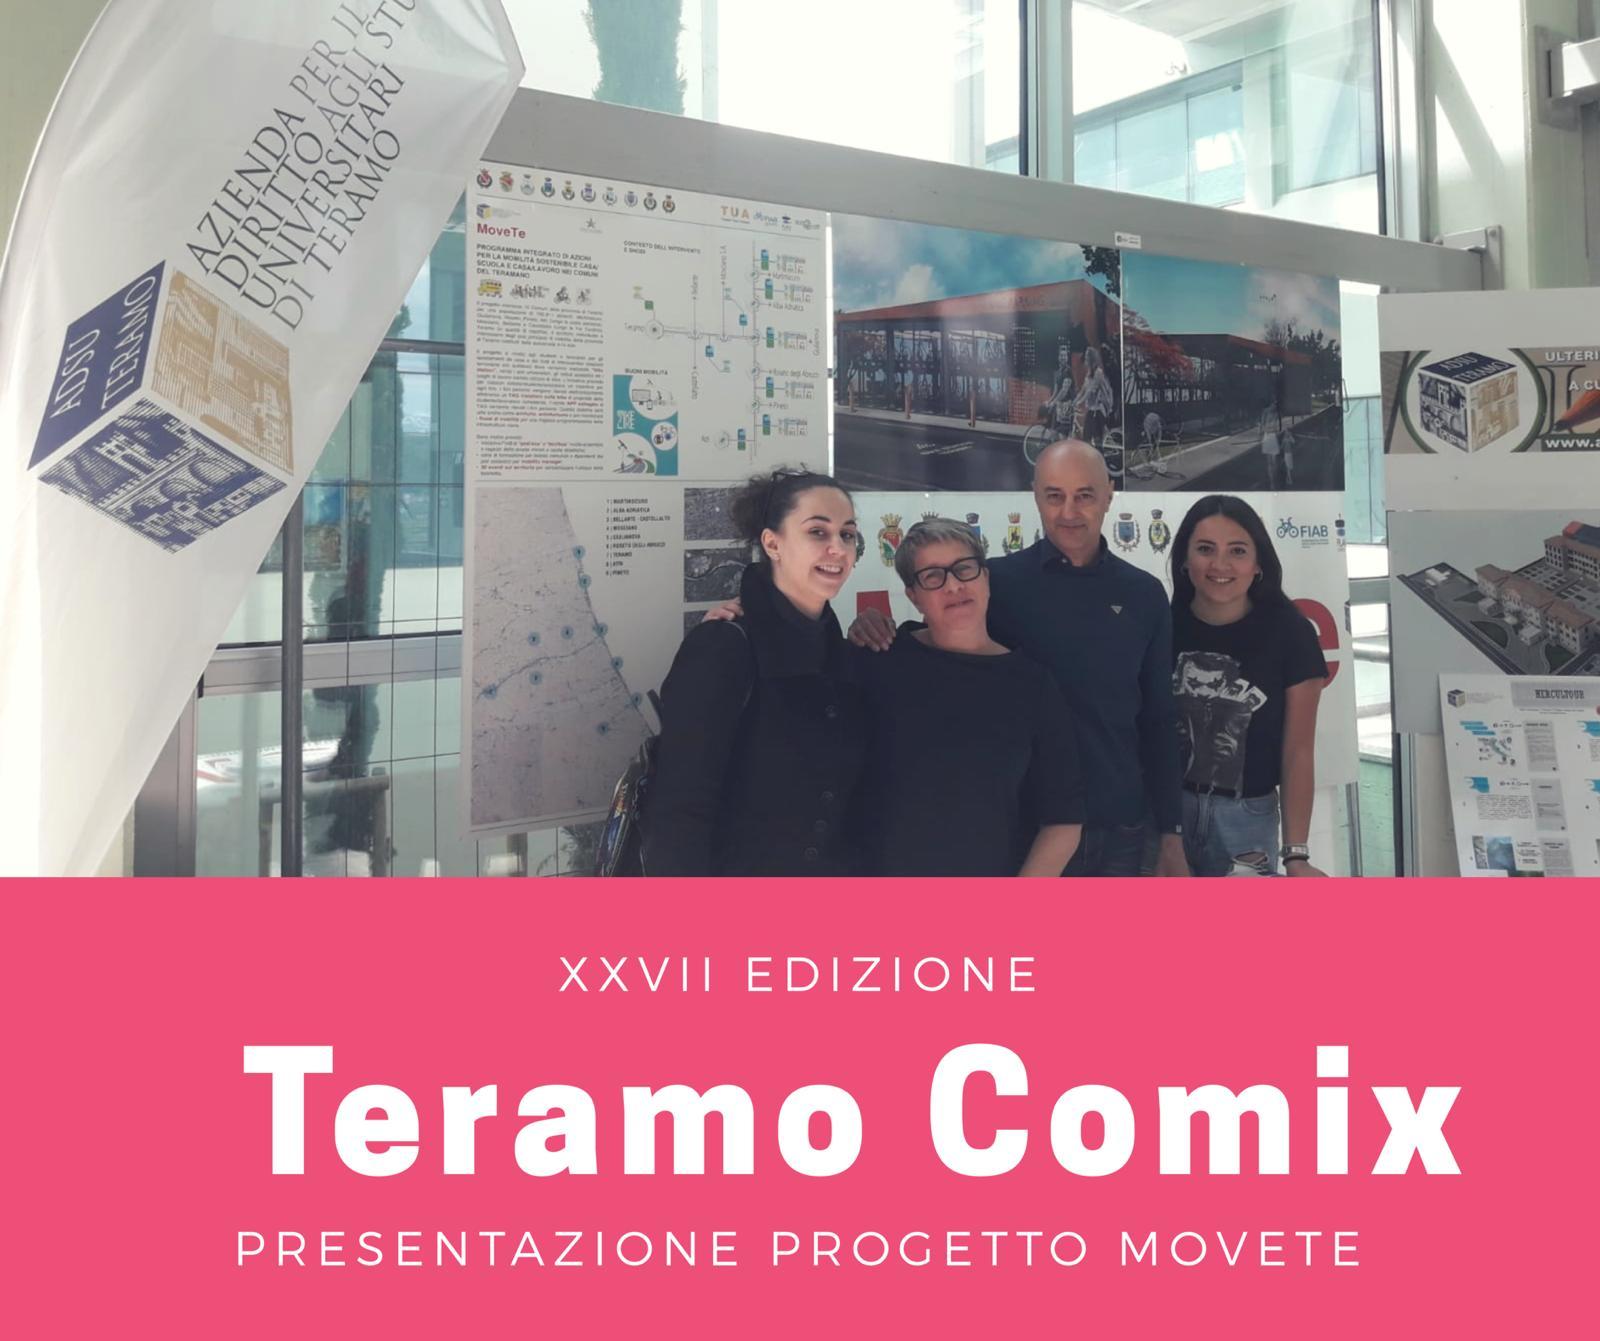 Teramo Comix 2019